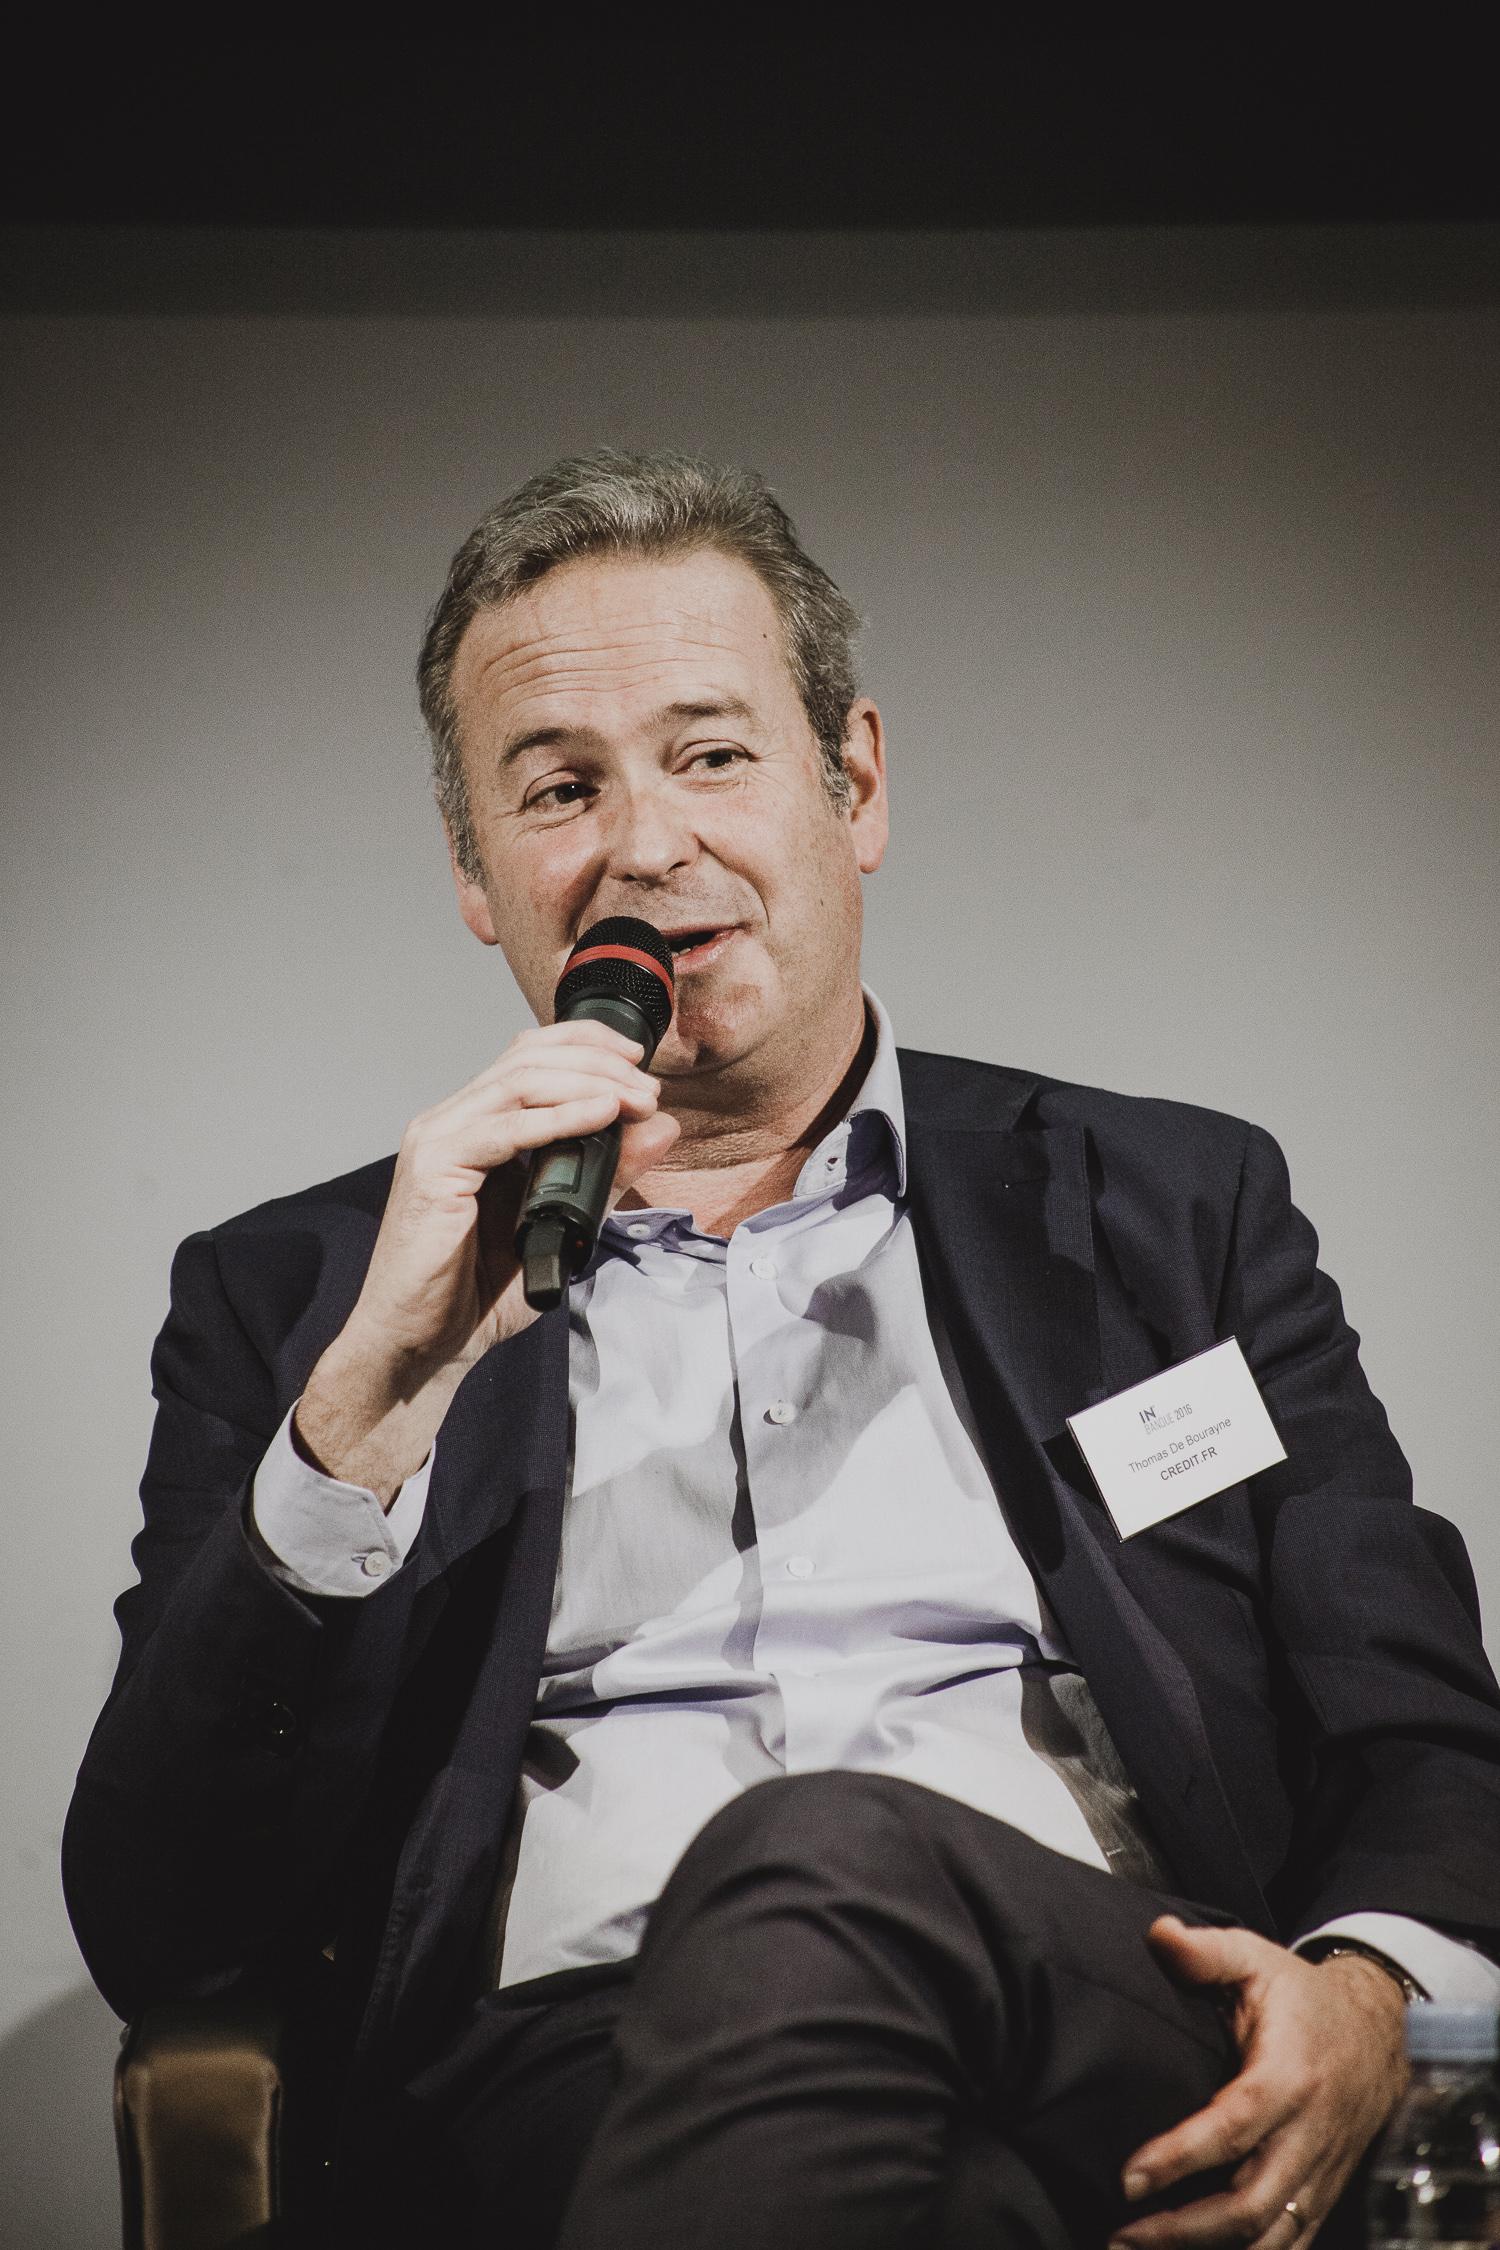 Thomas De Bourayne (Credit.fr) - IN BANQUE 2016 - Crédit photo : Guillermo Gomez